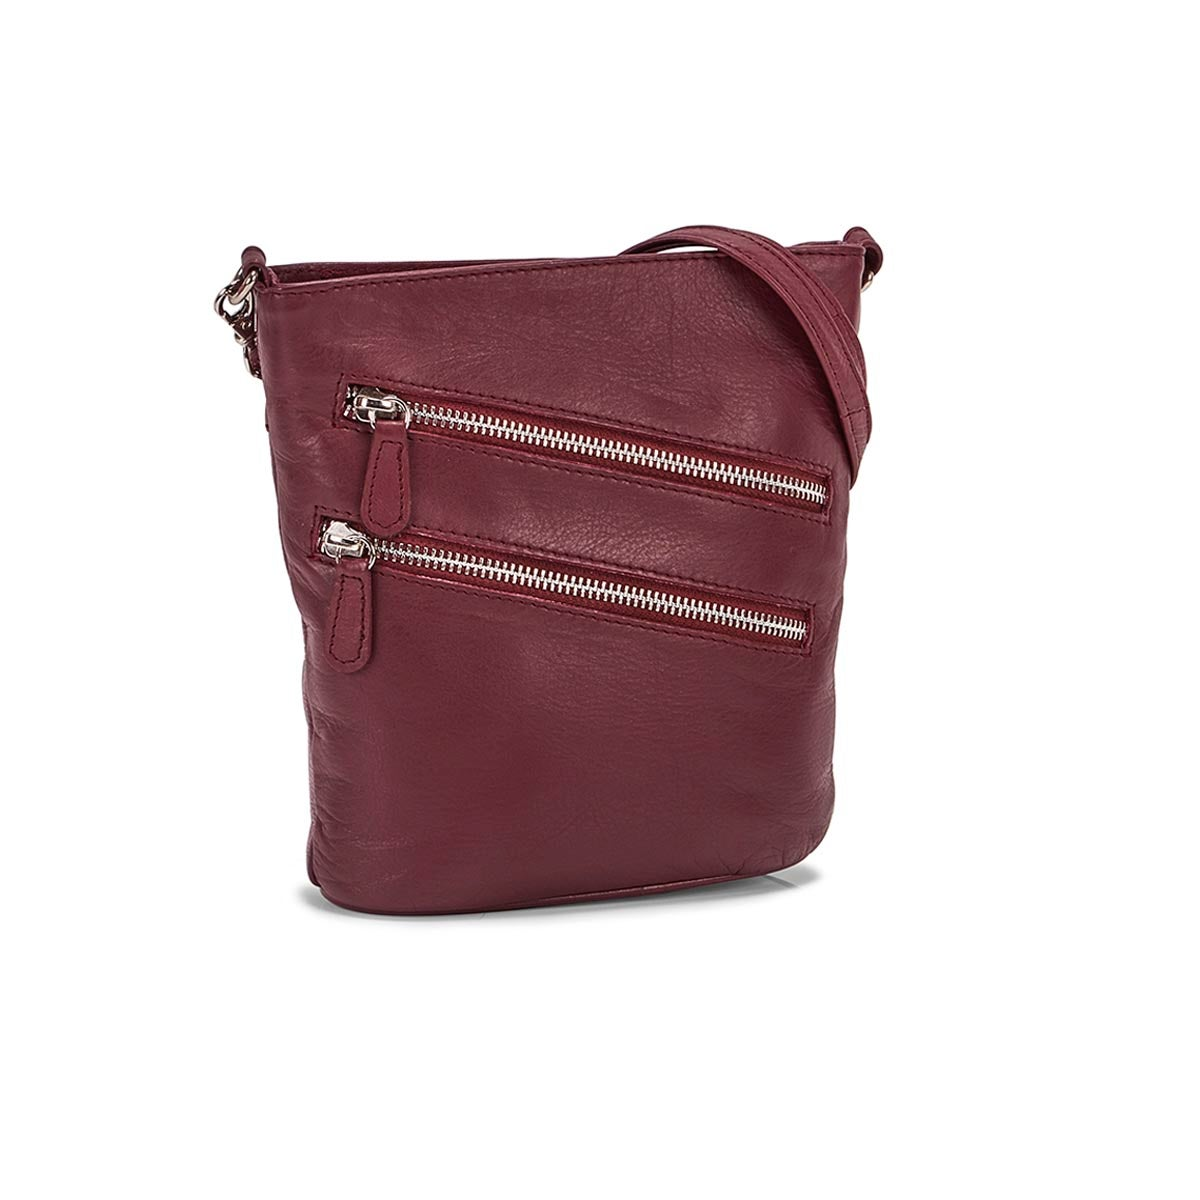 Lds Cassie bayberry crossbody bag